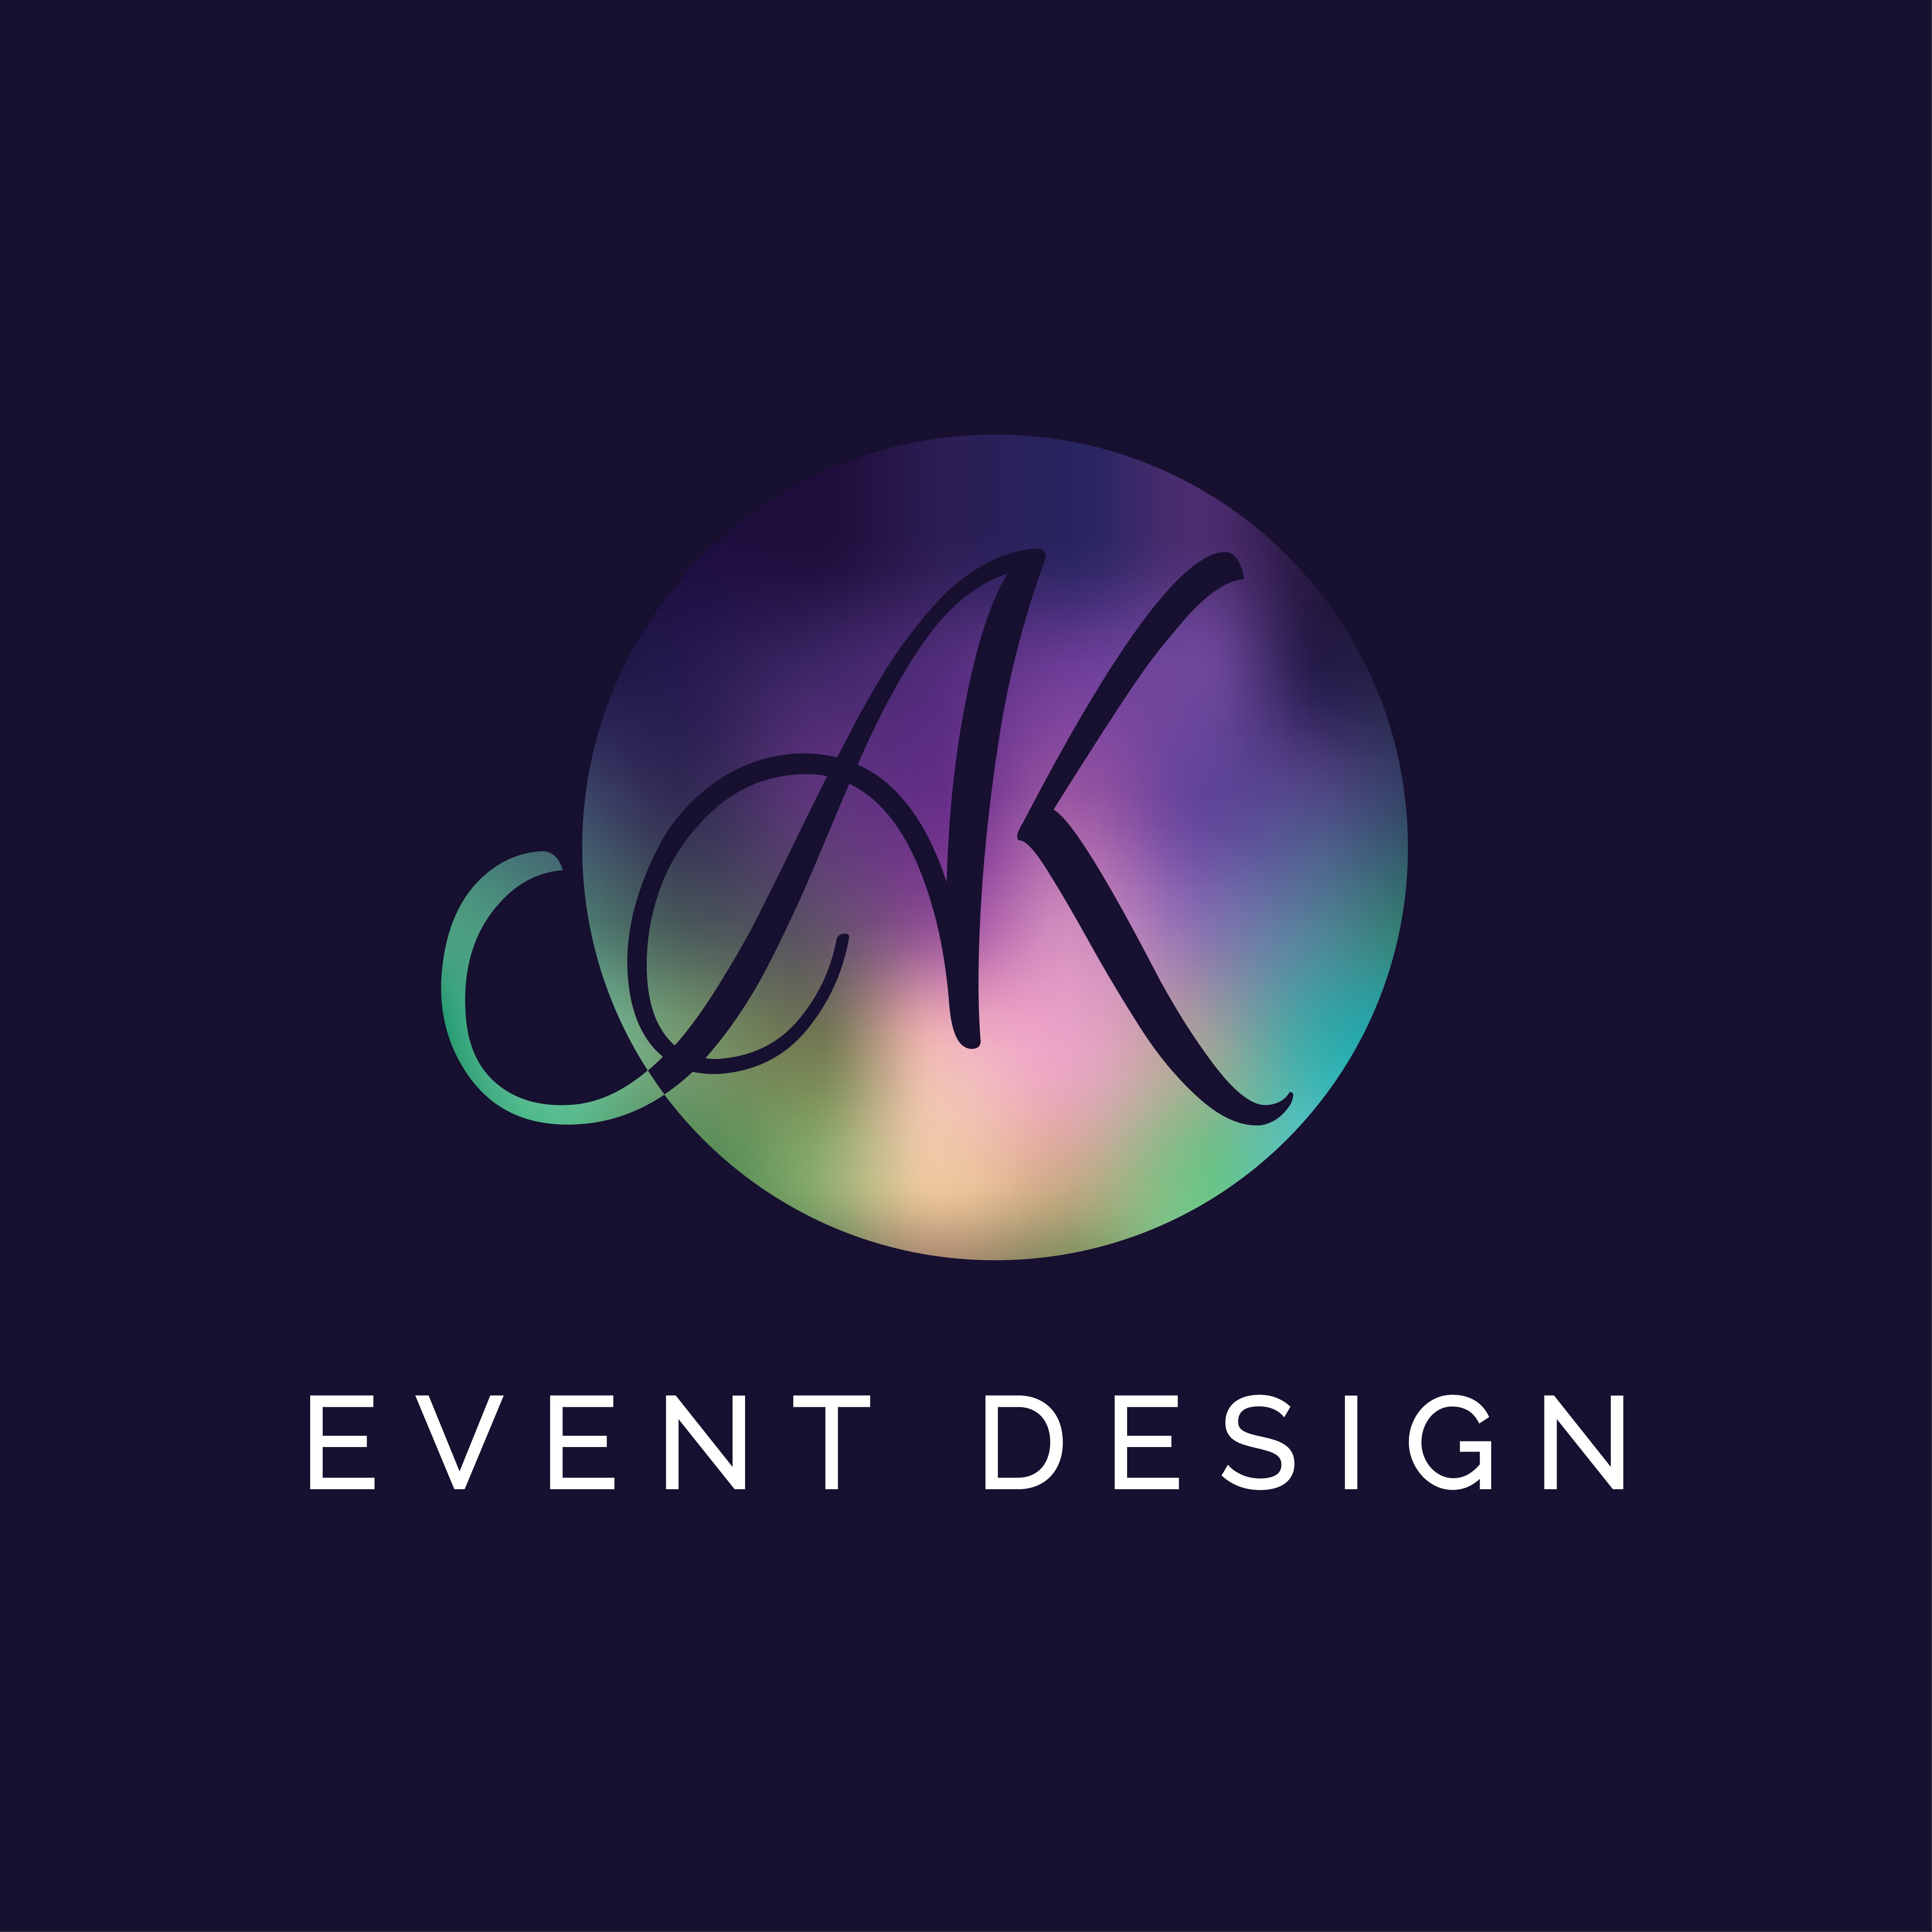 Alaska Northern Lights Design needed for event planning company